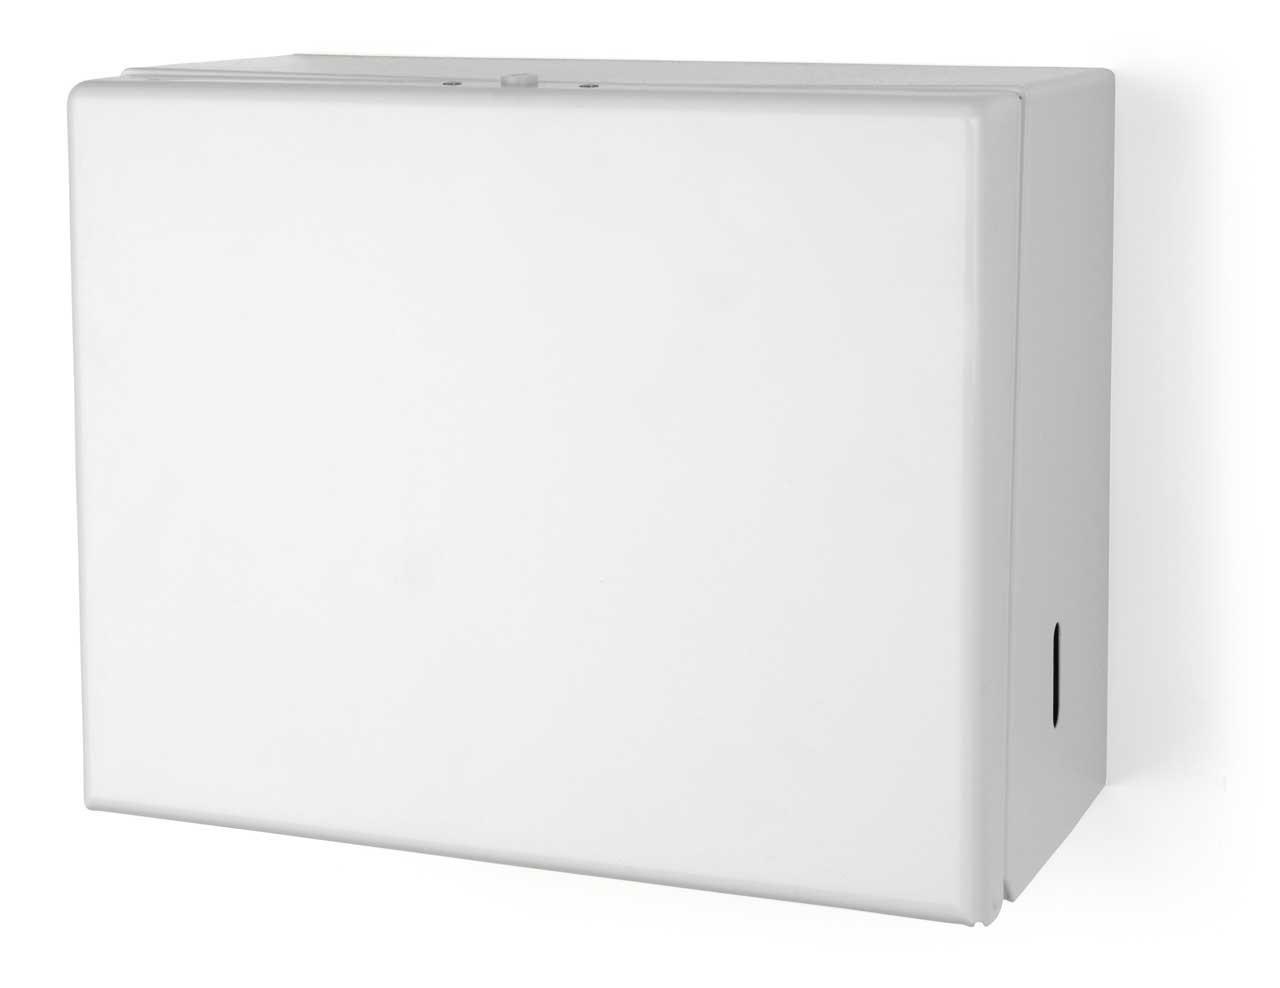 Palmer Fixture T91 Singlefold Towel Dispenser